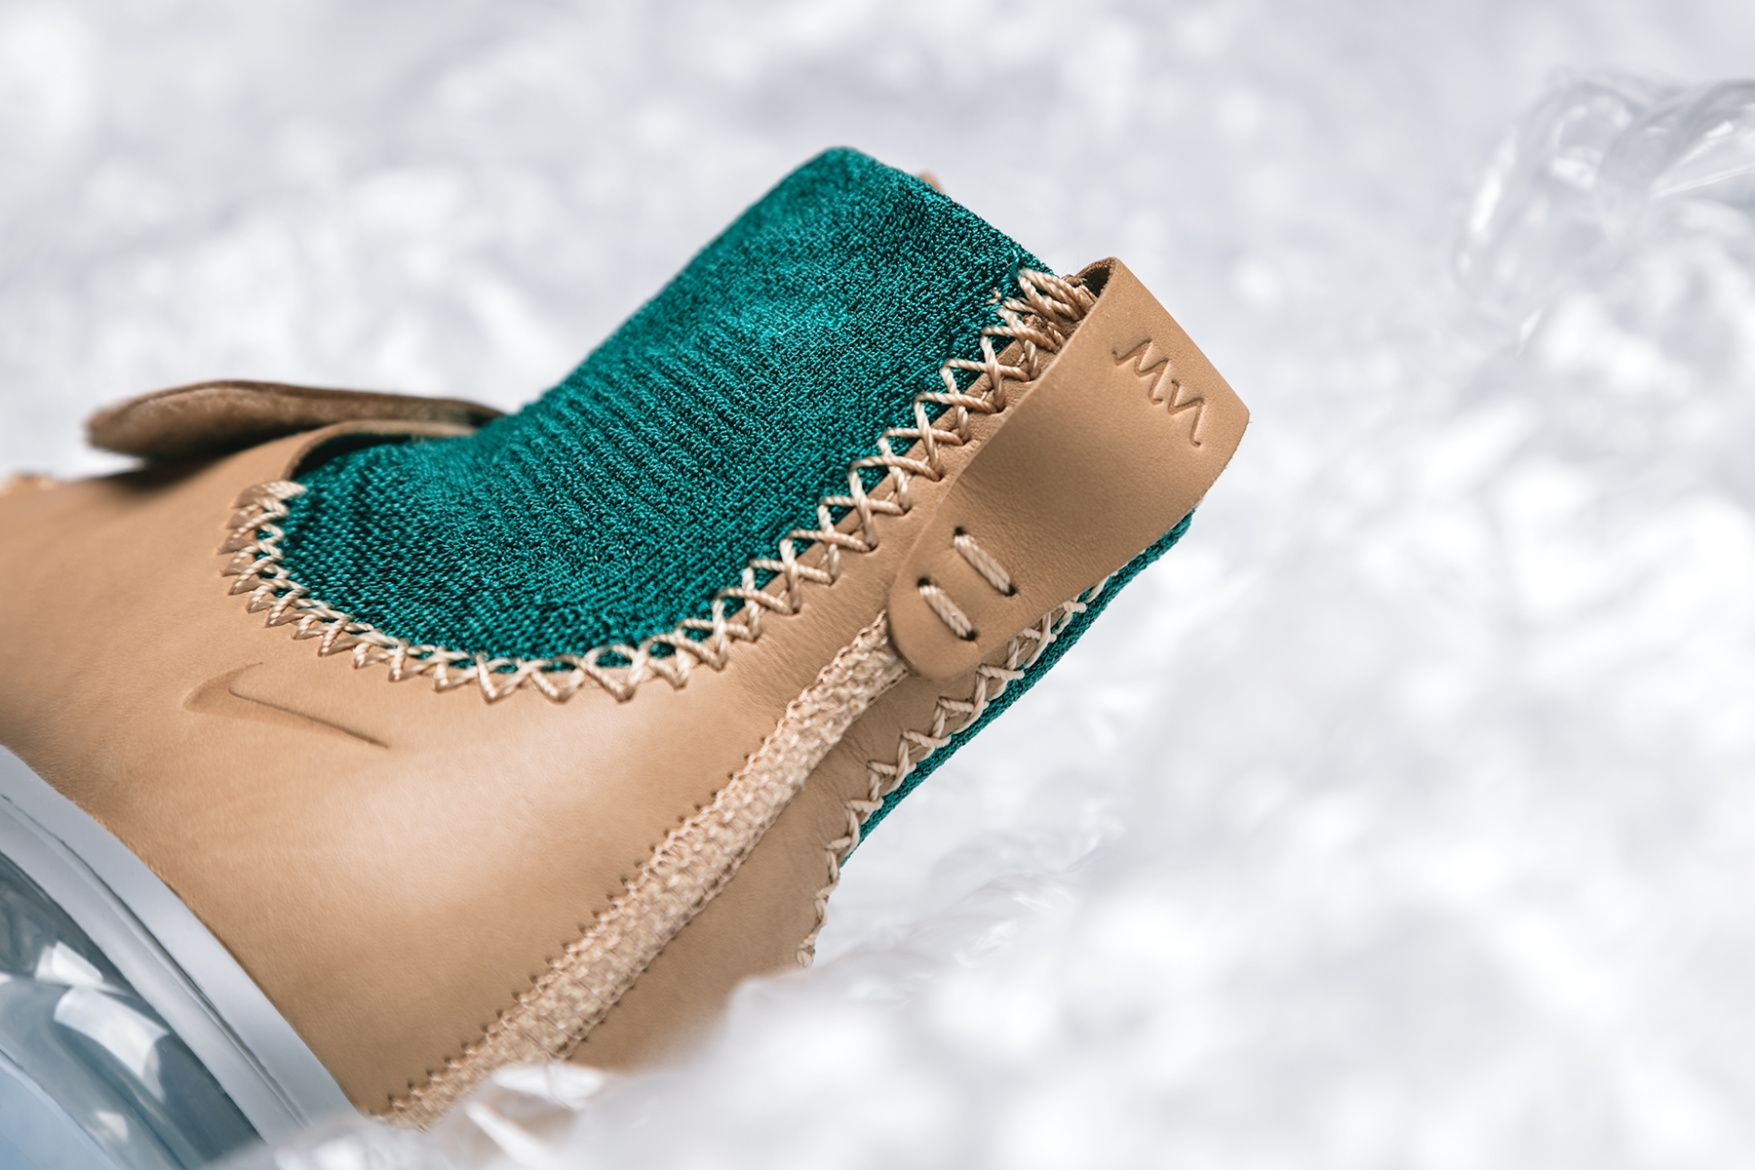 ffb25b1440eb3 近賞 NikeLab Air VaporMax x Marc Newson 聯名鞋款 | CMD. | Shoes ...